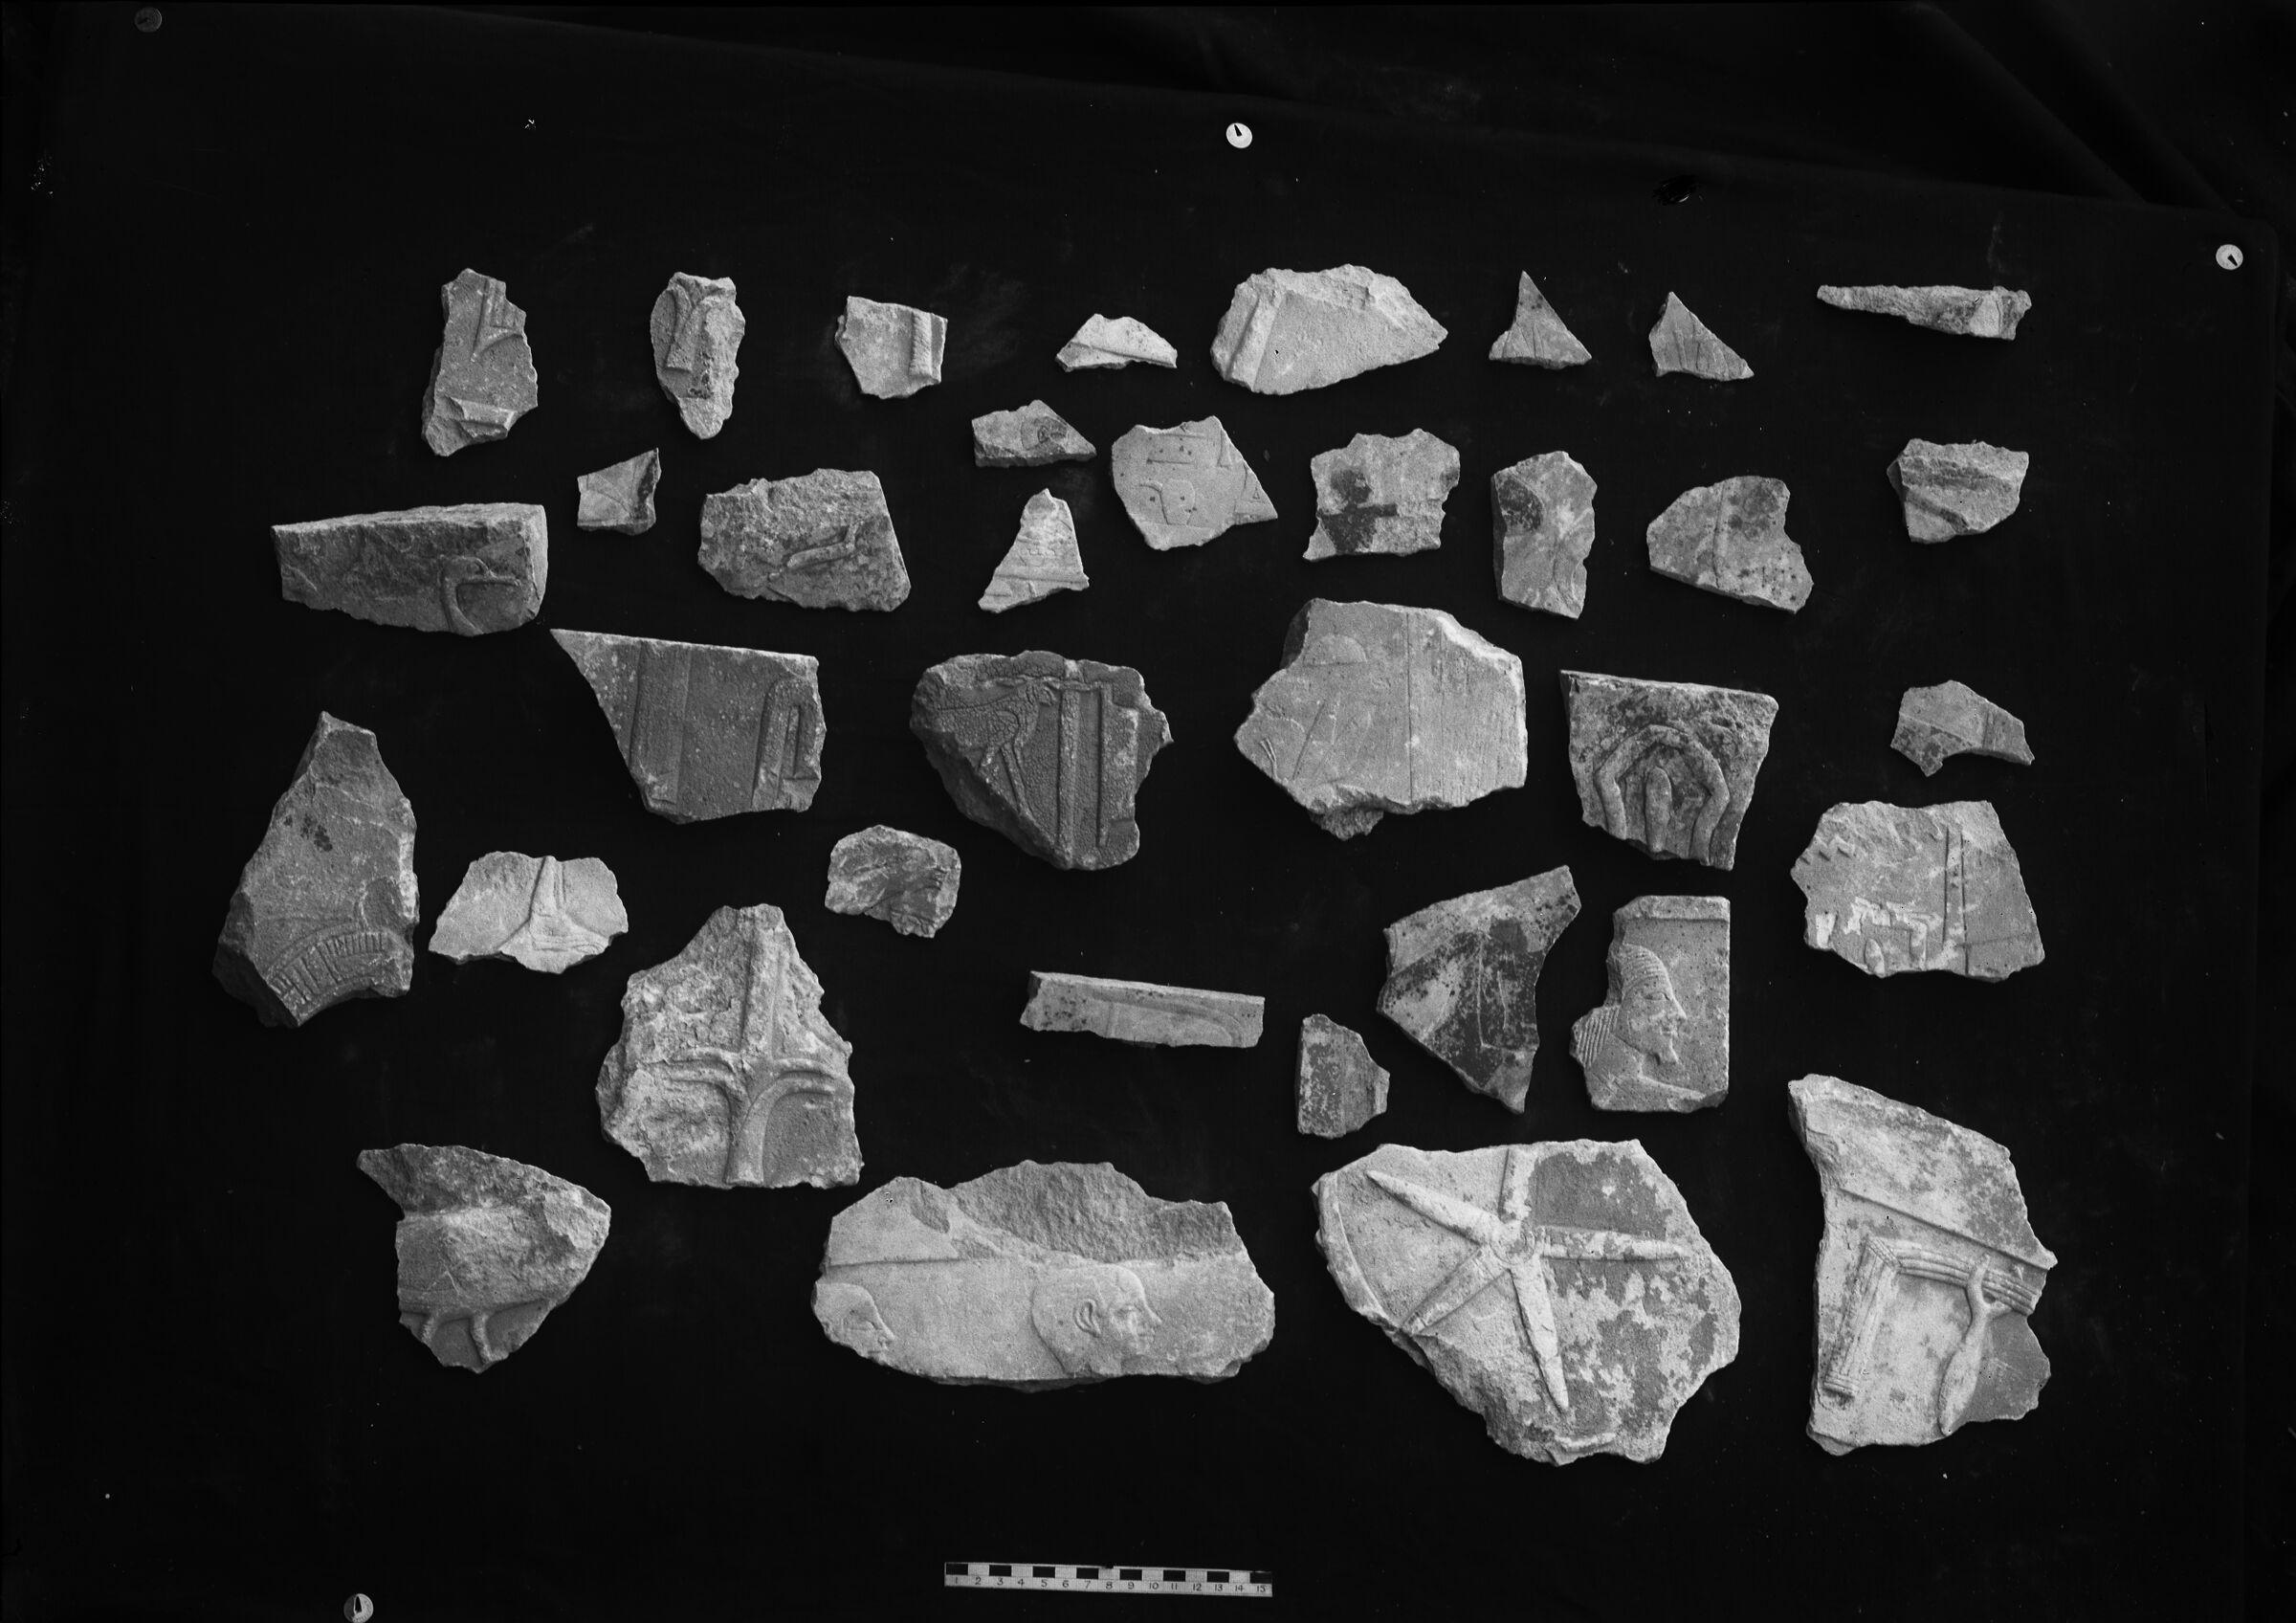 Object(s) photograph: Site: Giza; view: G 7110-7120, street G 7000, street G 7300, G 7310-7320, G I-b, street G 7400, avenue G 1, Khufu pyramid temple